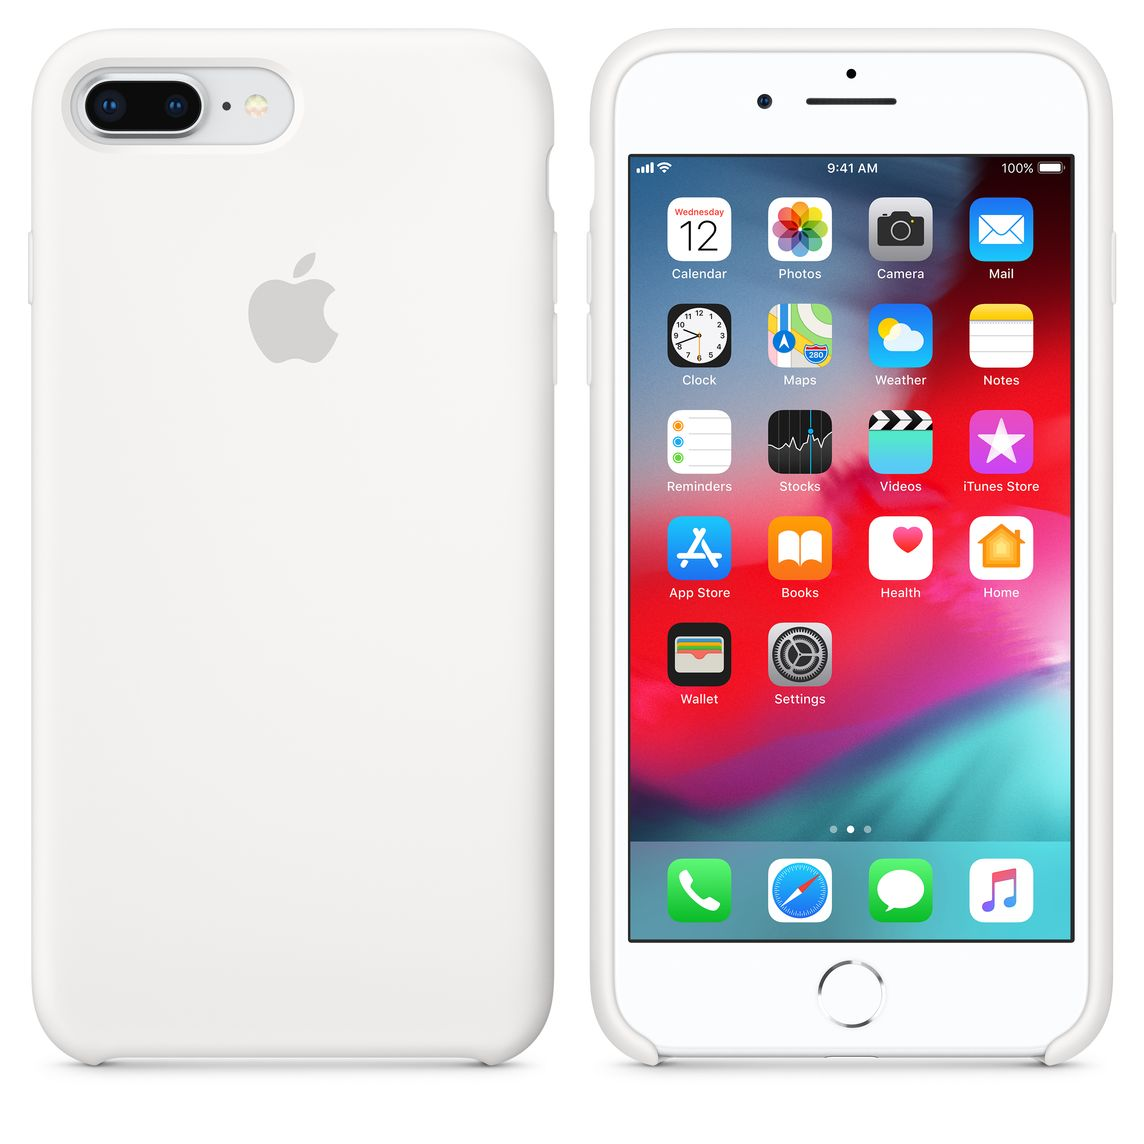 Kjøp Ladere til iPhone 7 og iPhone 8